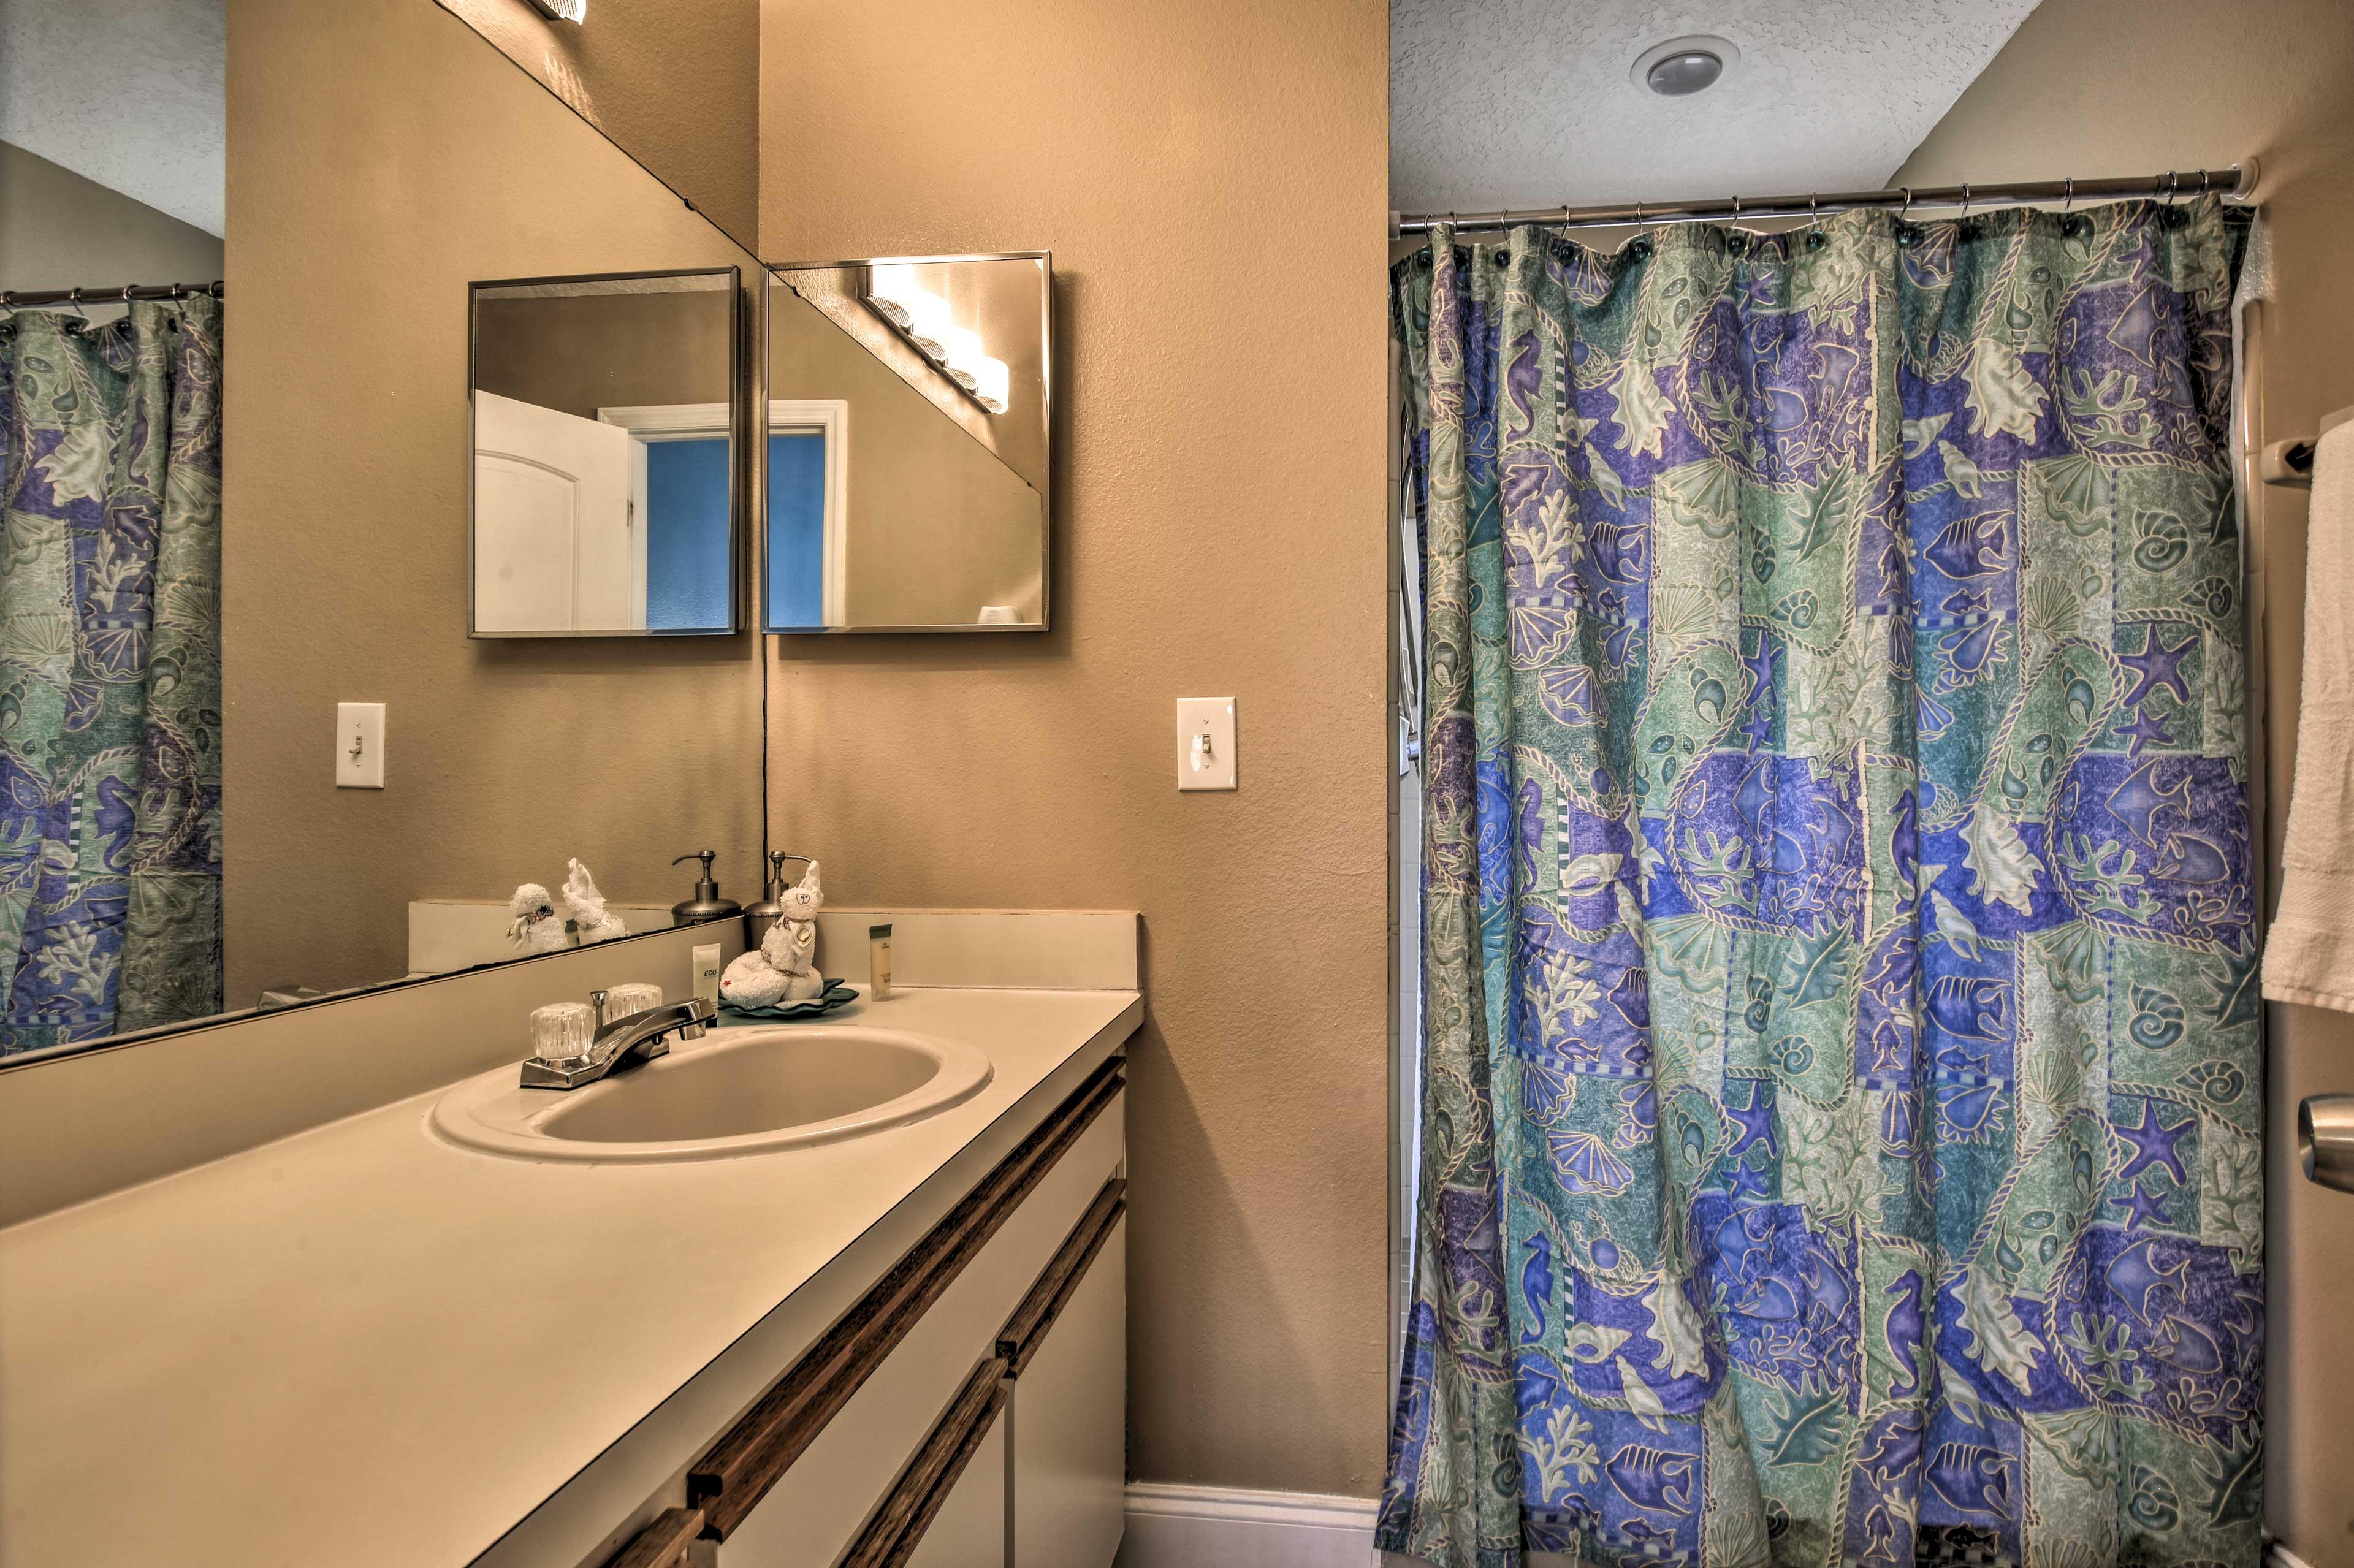 The en-suite bathroom has a walk-in shower.